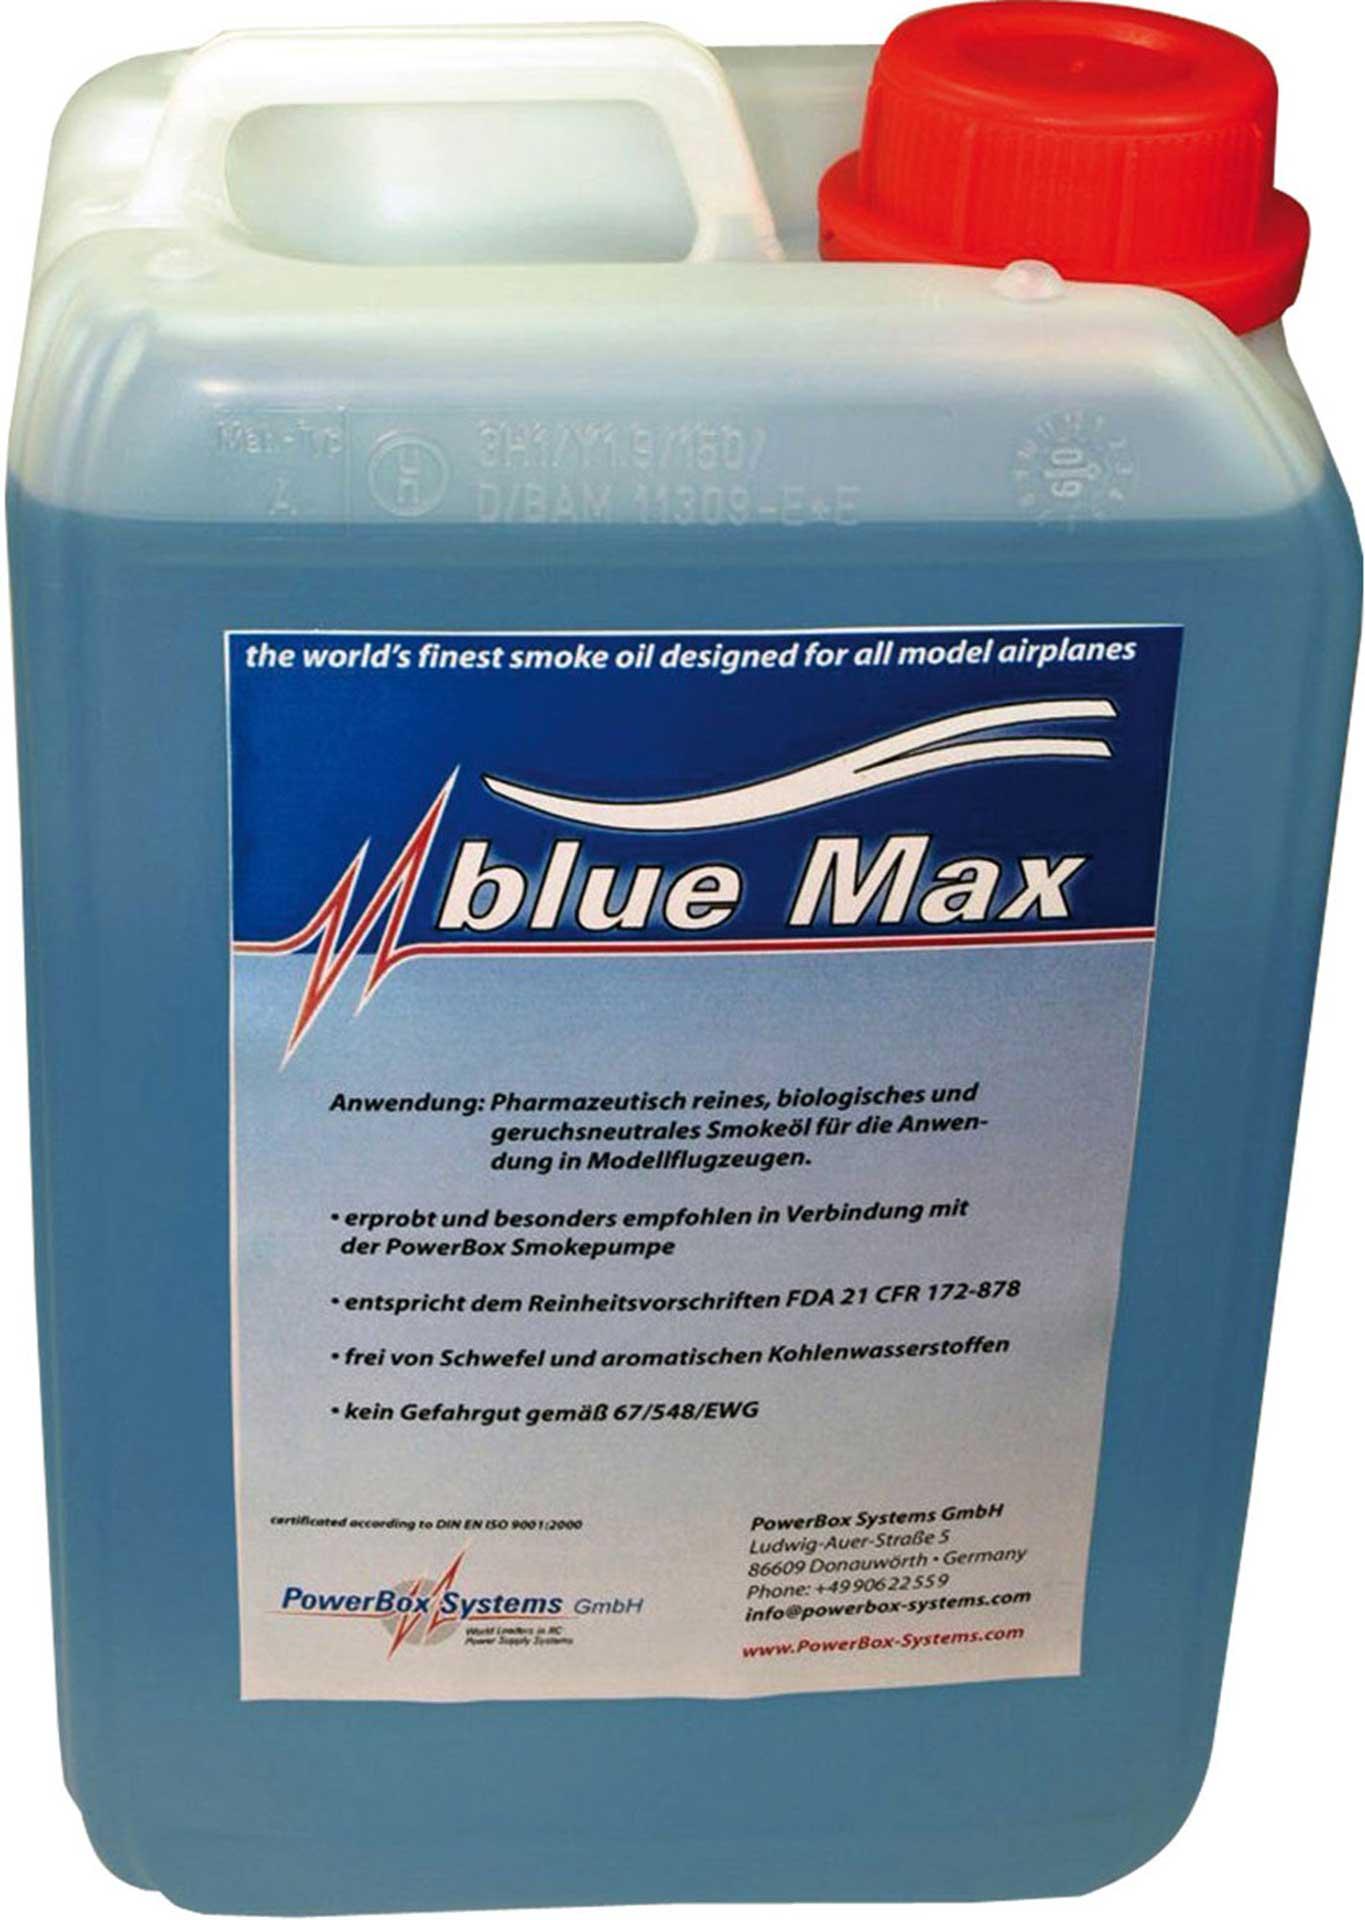 POWERBOX SYSTEMS SMOKE OIL BLUE MAX 5 LITER SMOKING OIL